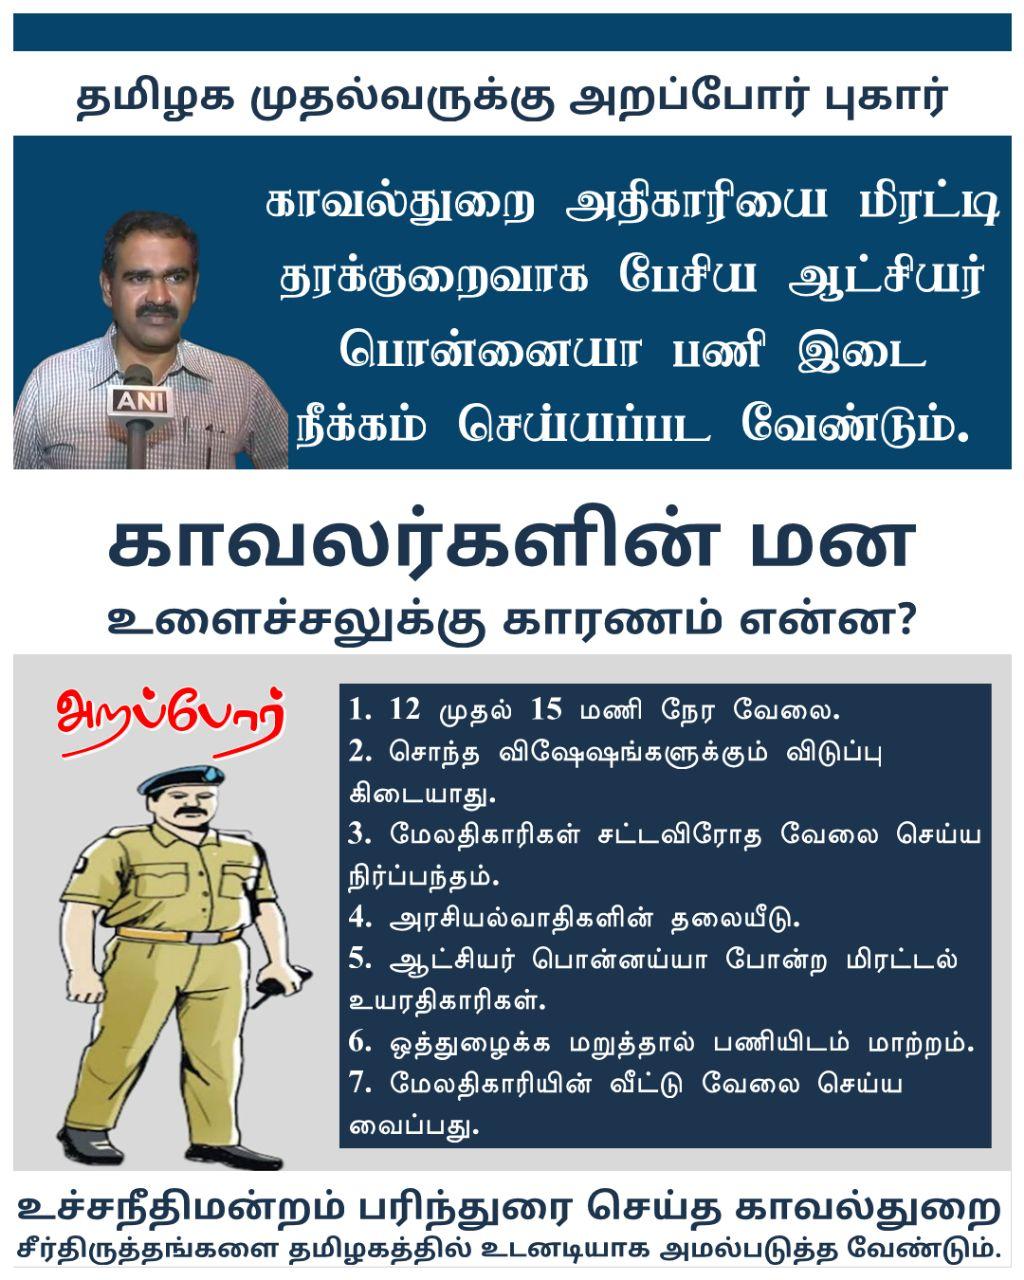 Suspend Col.Ponnaiya and Bring Police Reforms